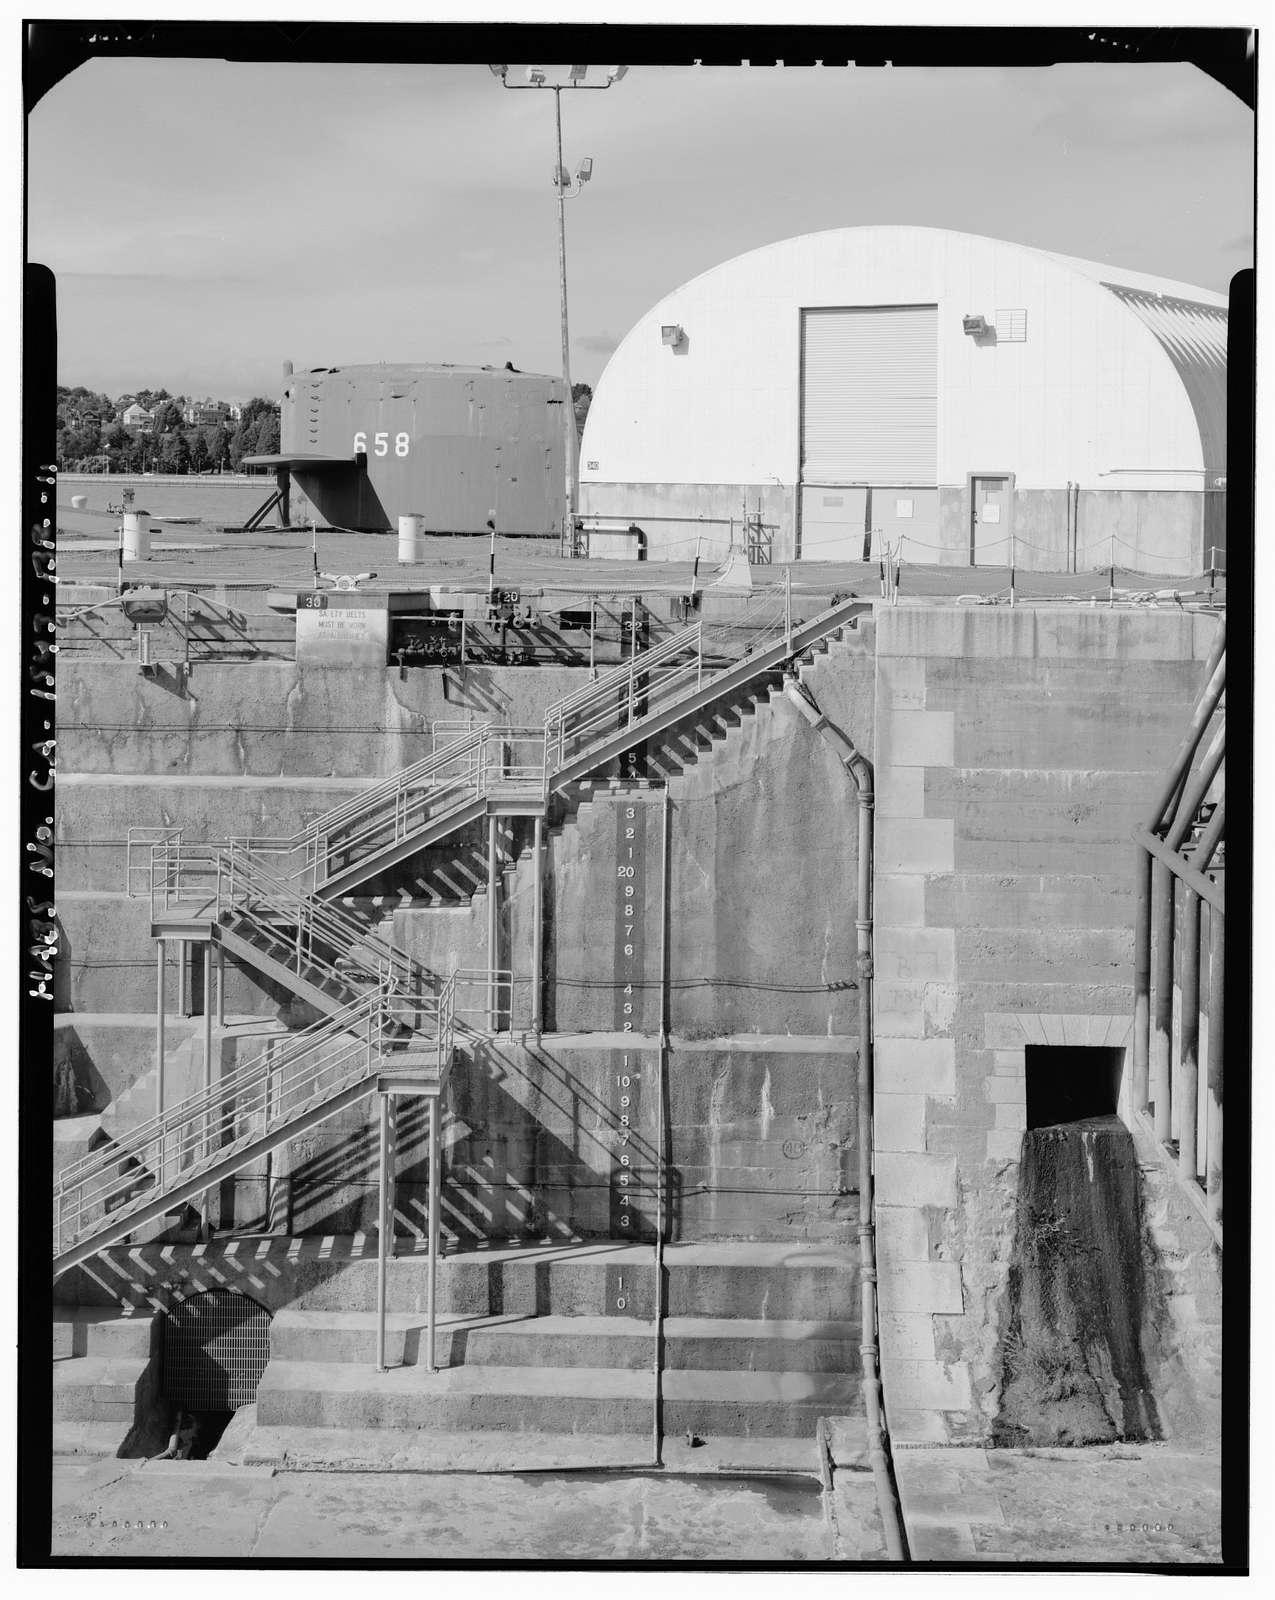 Mare Island Naval Shipyard, Drydock No. 2, California Avenue, east side near Ninth Street, Vallejo, Solano County, CA